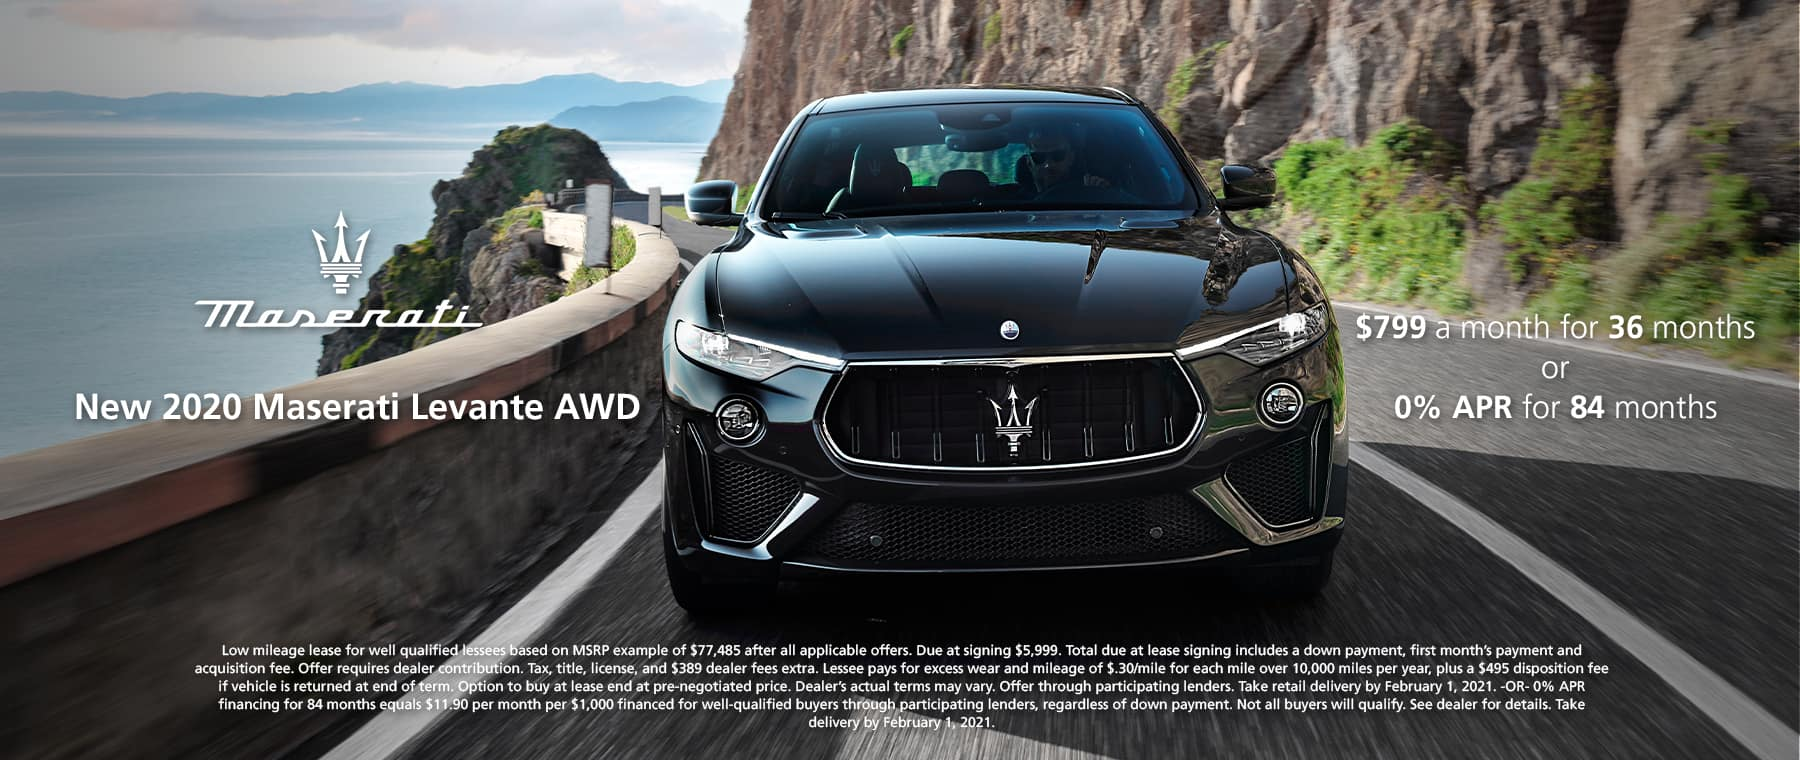 MAS6086_MaseratiAllen_21Jan_Sales_LevanteMY20_1800x760